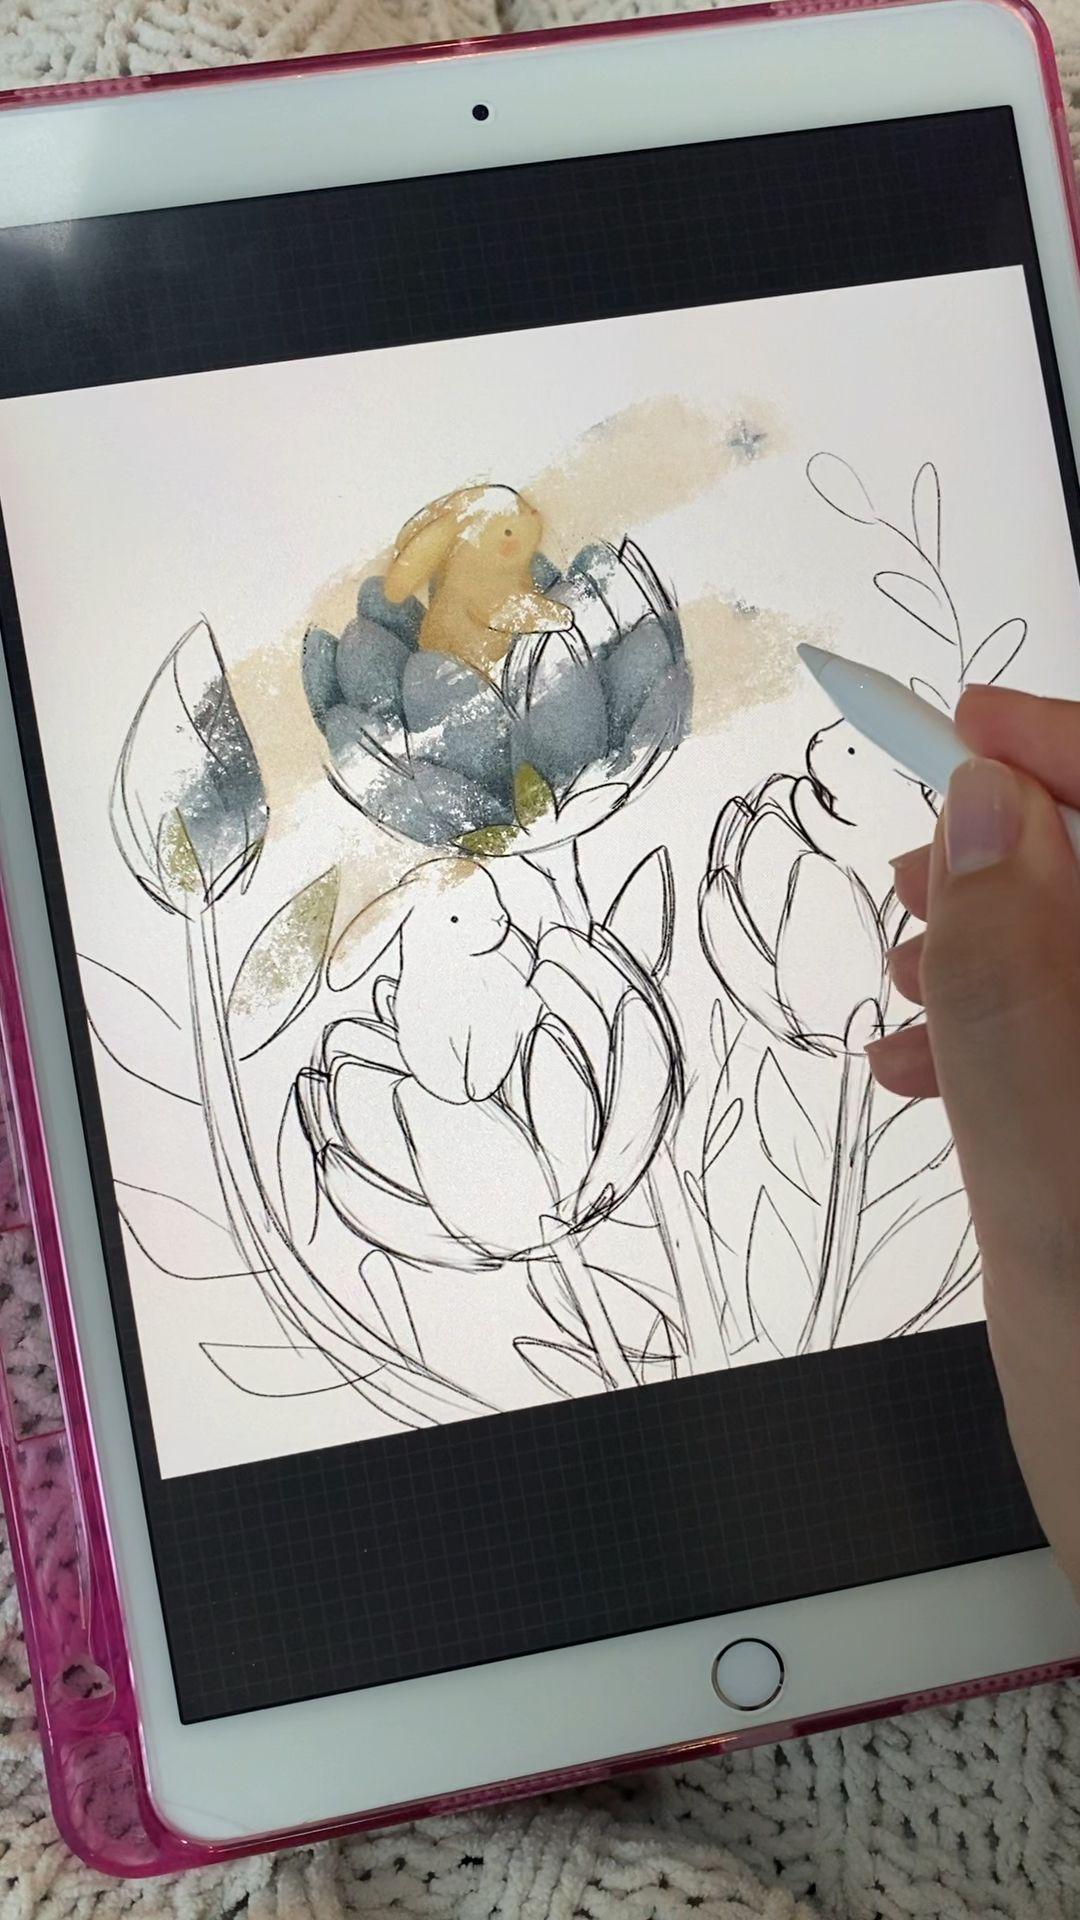 Bunny flower buds illustration